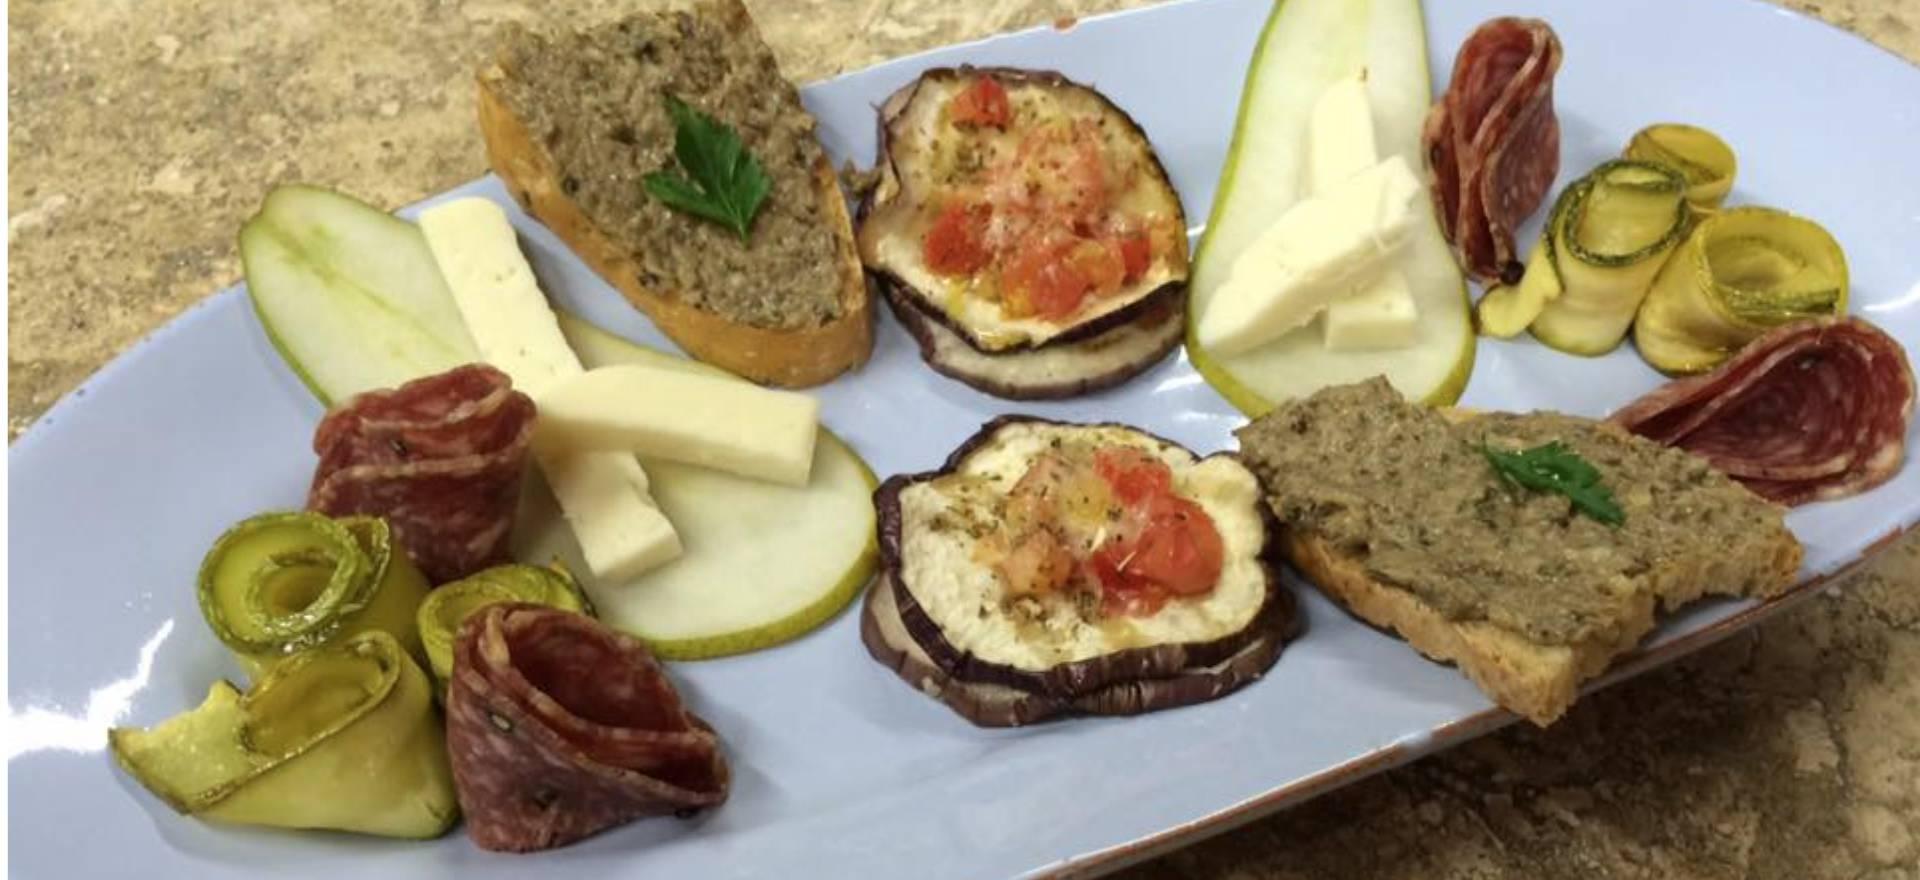 Agriturismo Toscane Culinaire agriturismo in het hart van Toscane